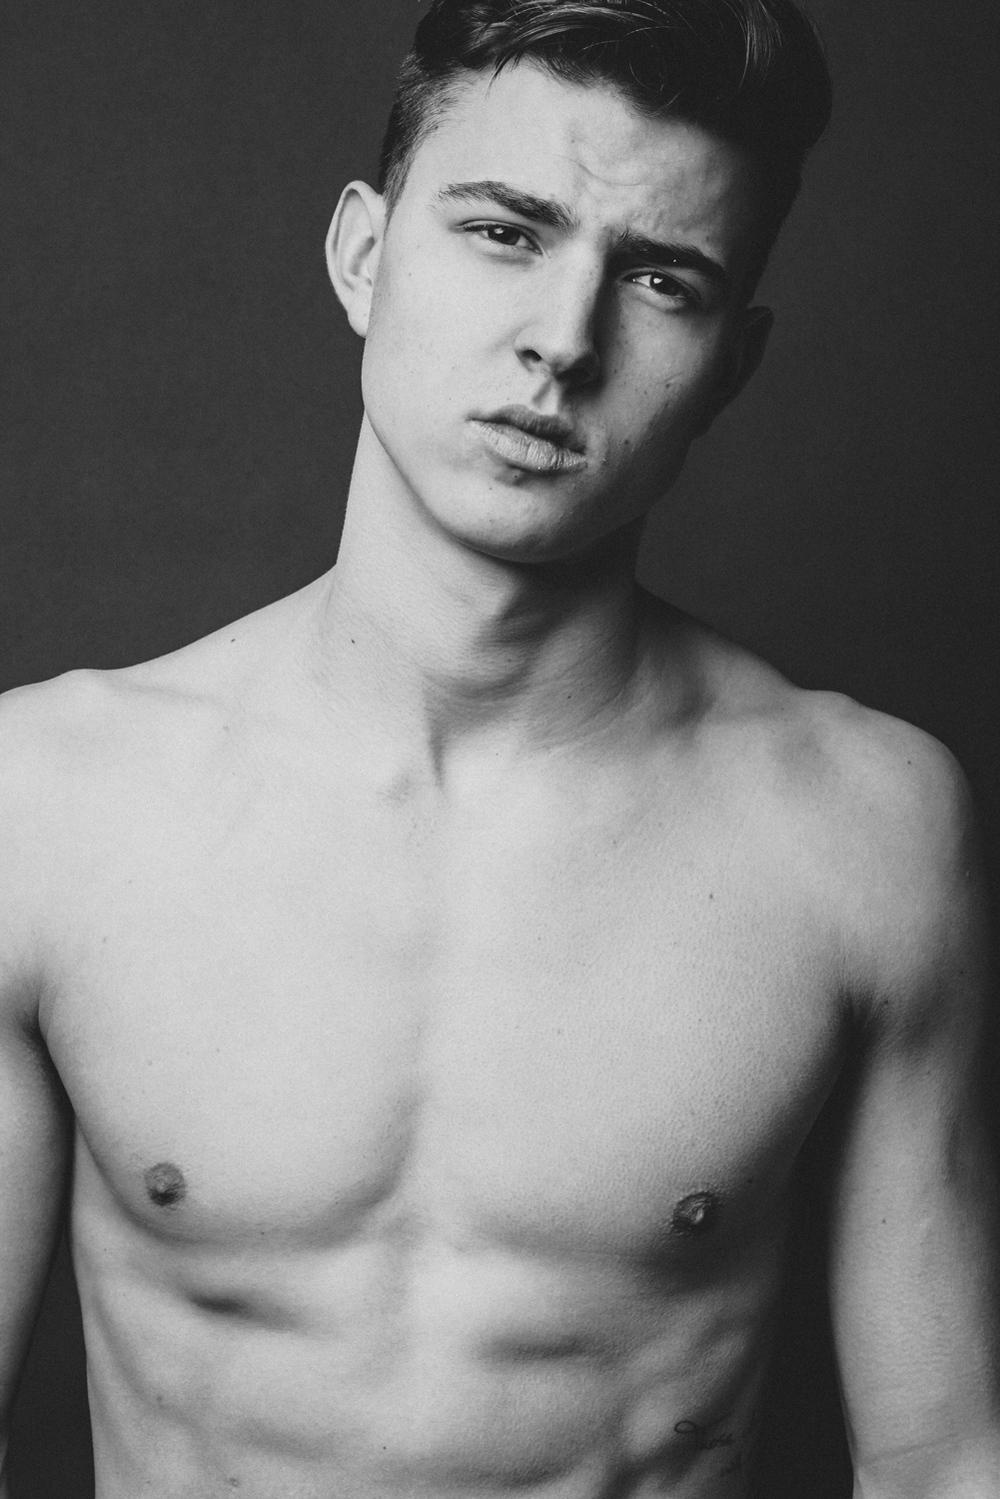 Nathan-46.jpg